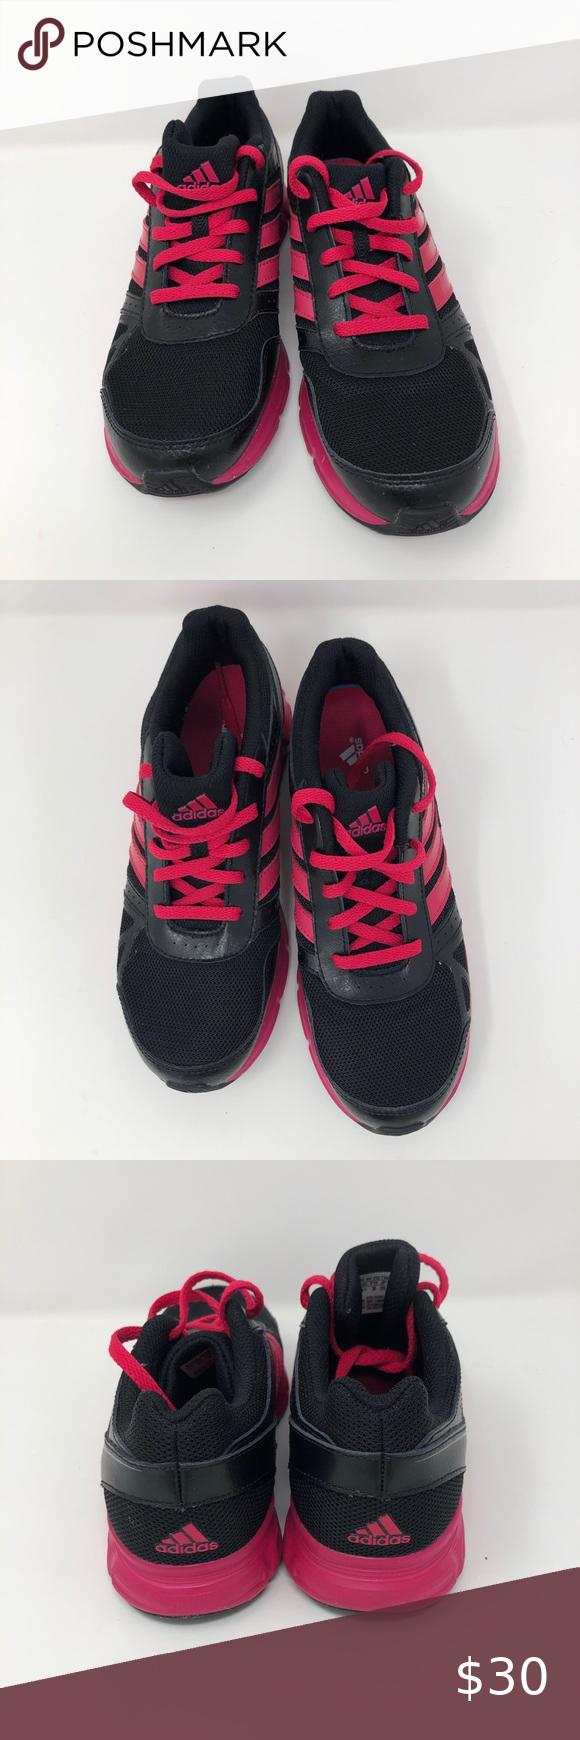 adidas trainers junior size 4